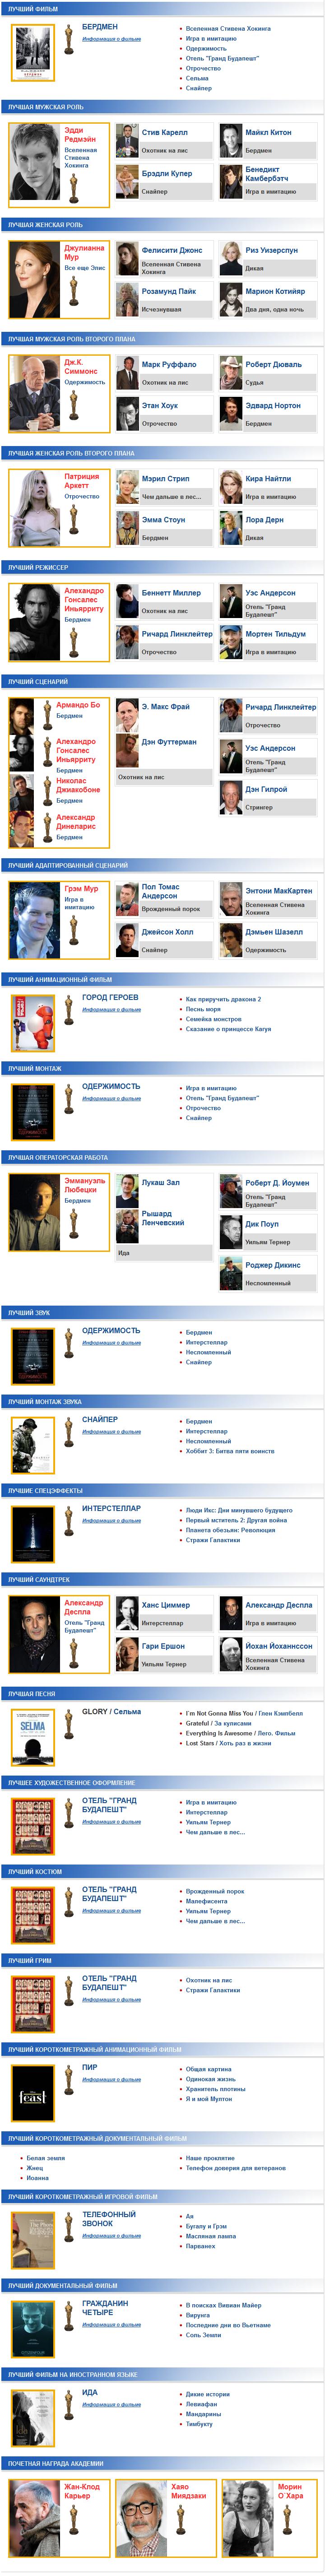 Оскар 2015 результаты - 2